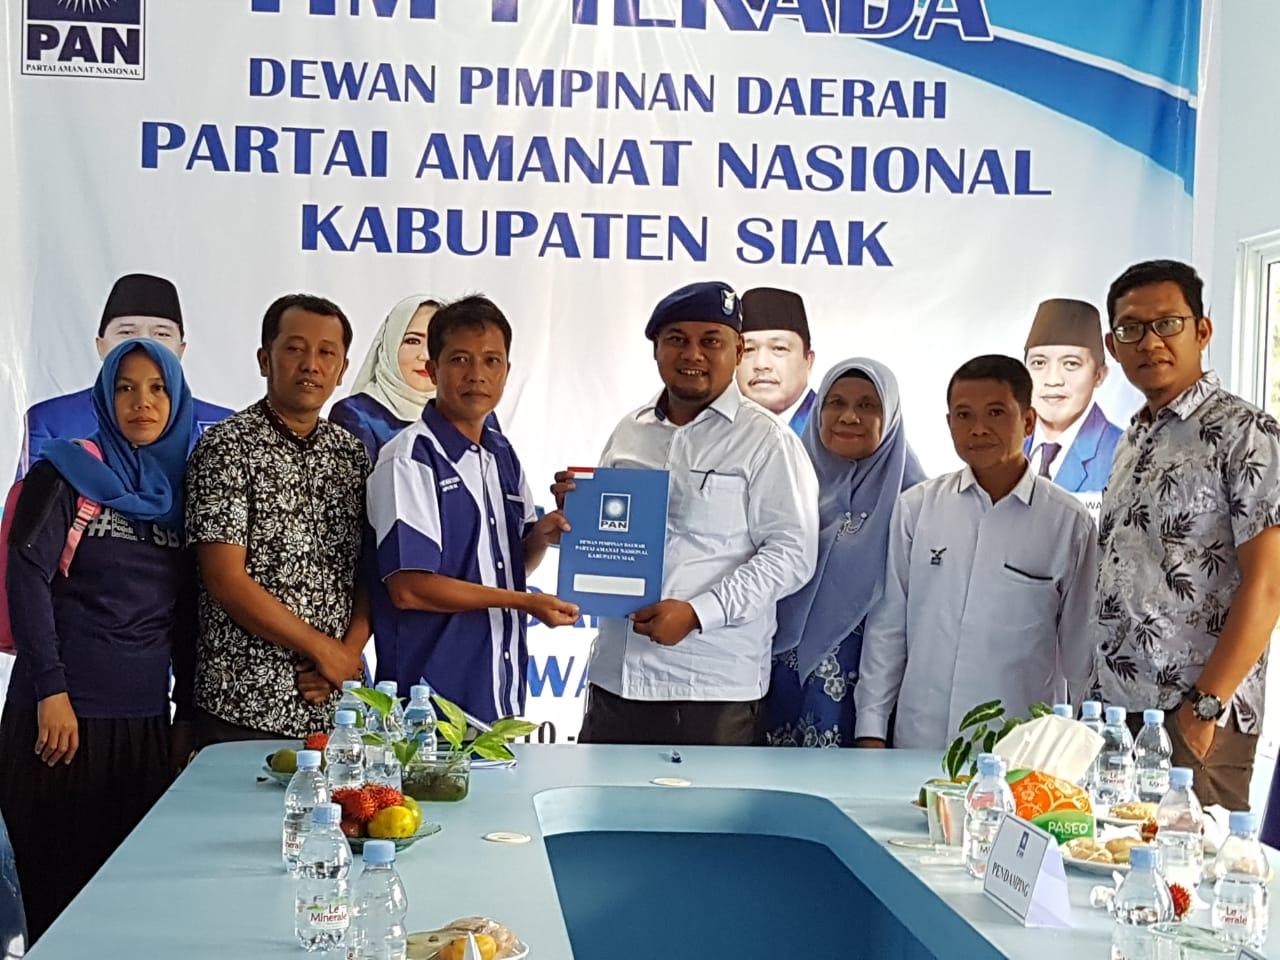 Syamsurizal Budi Serahkan Berkas Pendaftaran ke DPD PAN Siak